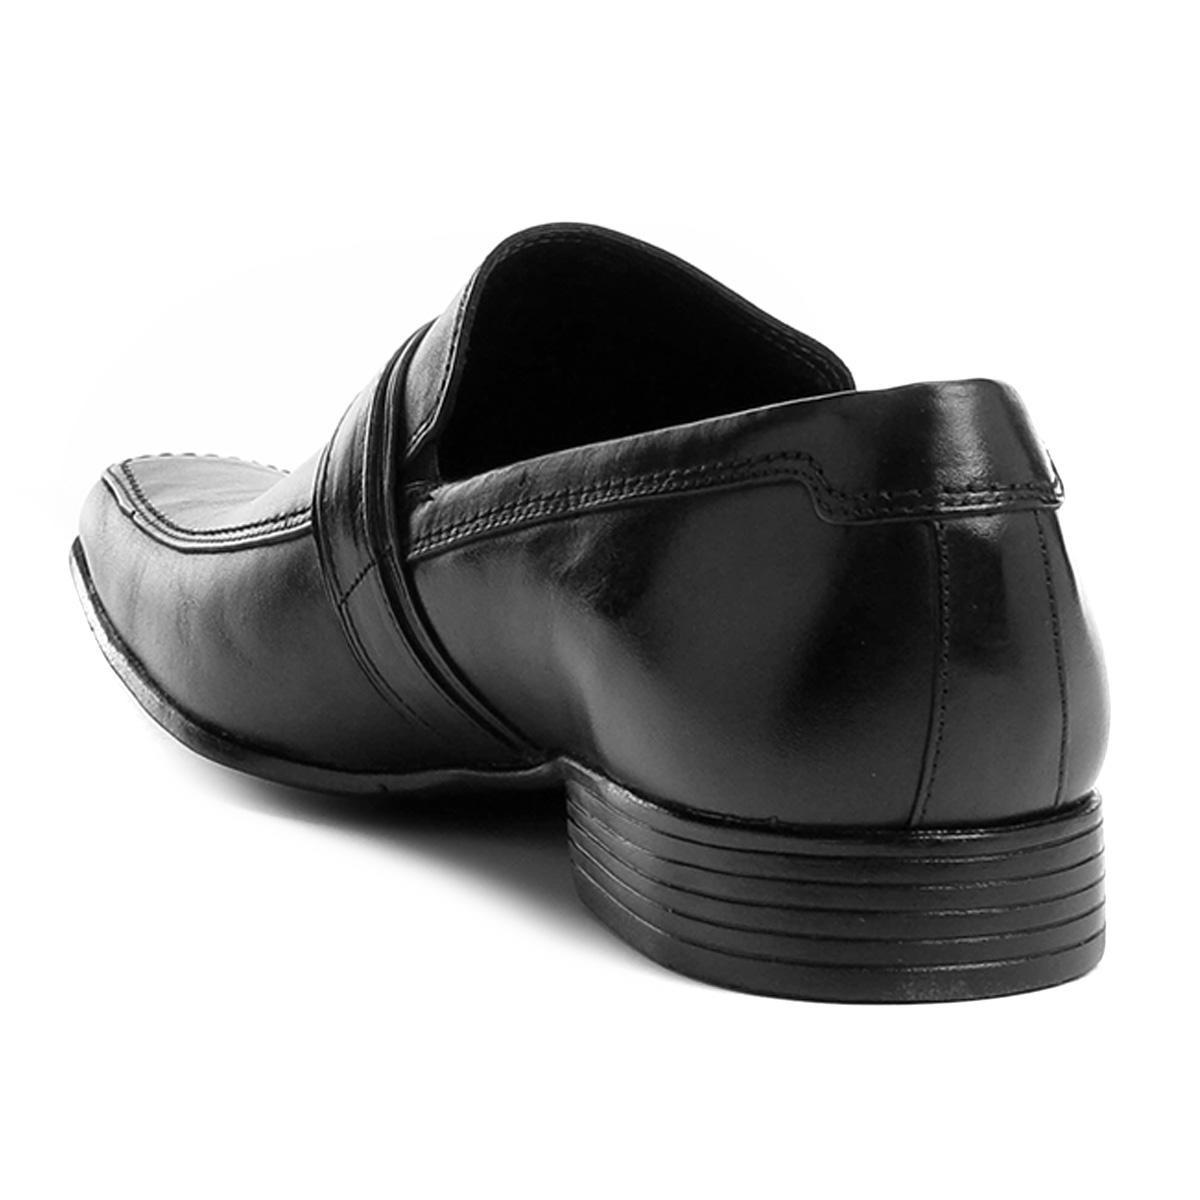 399546df40 sapato social couro shoestock fivela masculino. Carregando zoom.